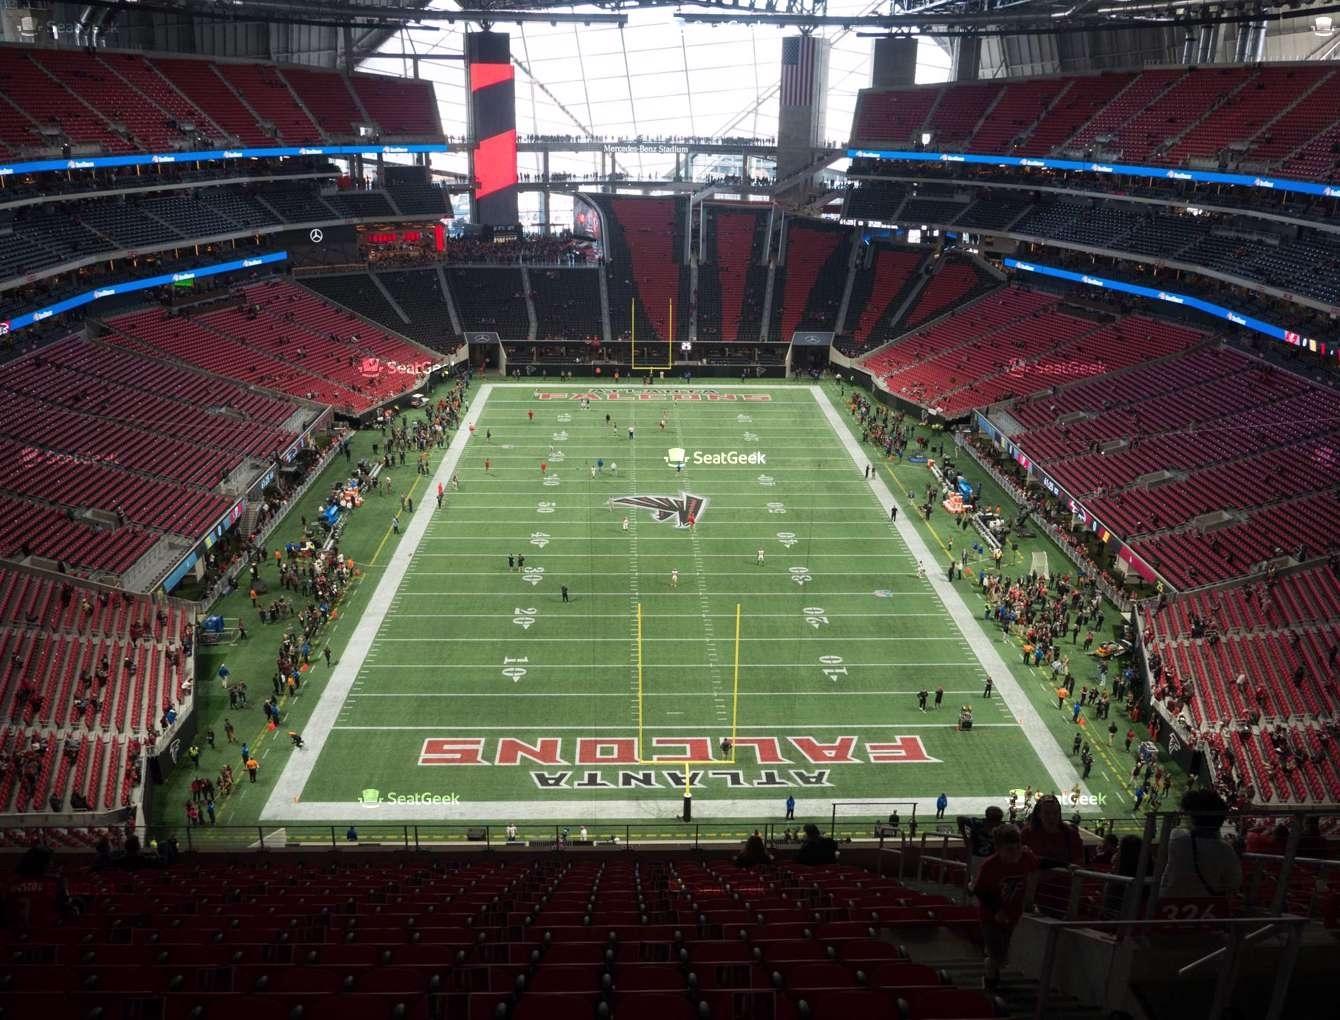 Mercedes-Benz Stadium Section 326 Seat Views | Seatgeek with Mercedes Benz Stadium Super Bowl Seating Chart